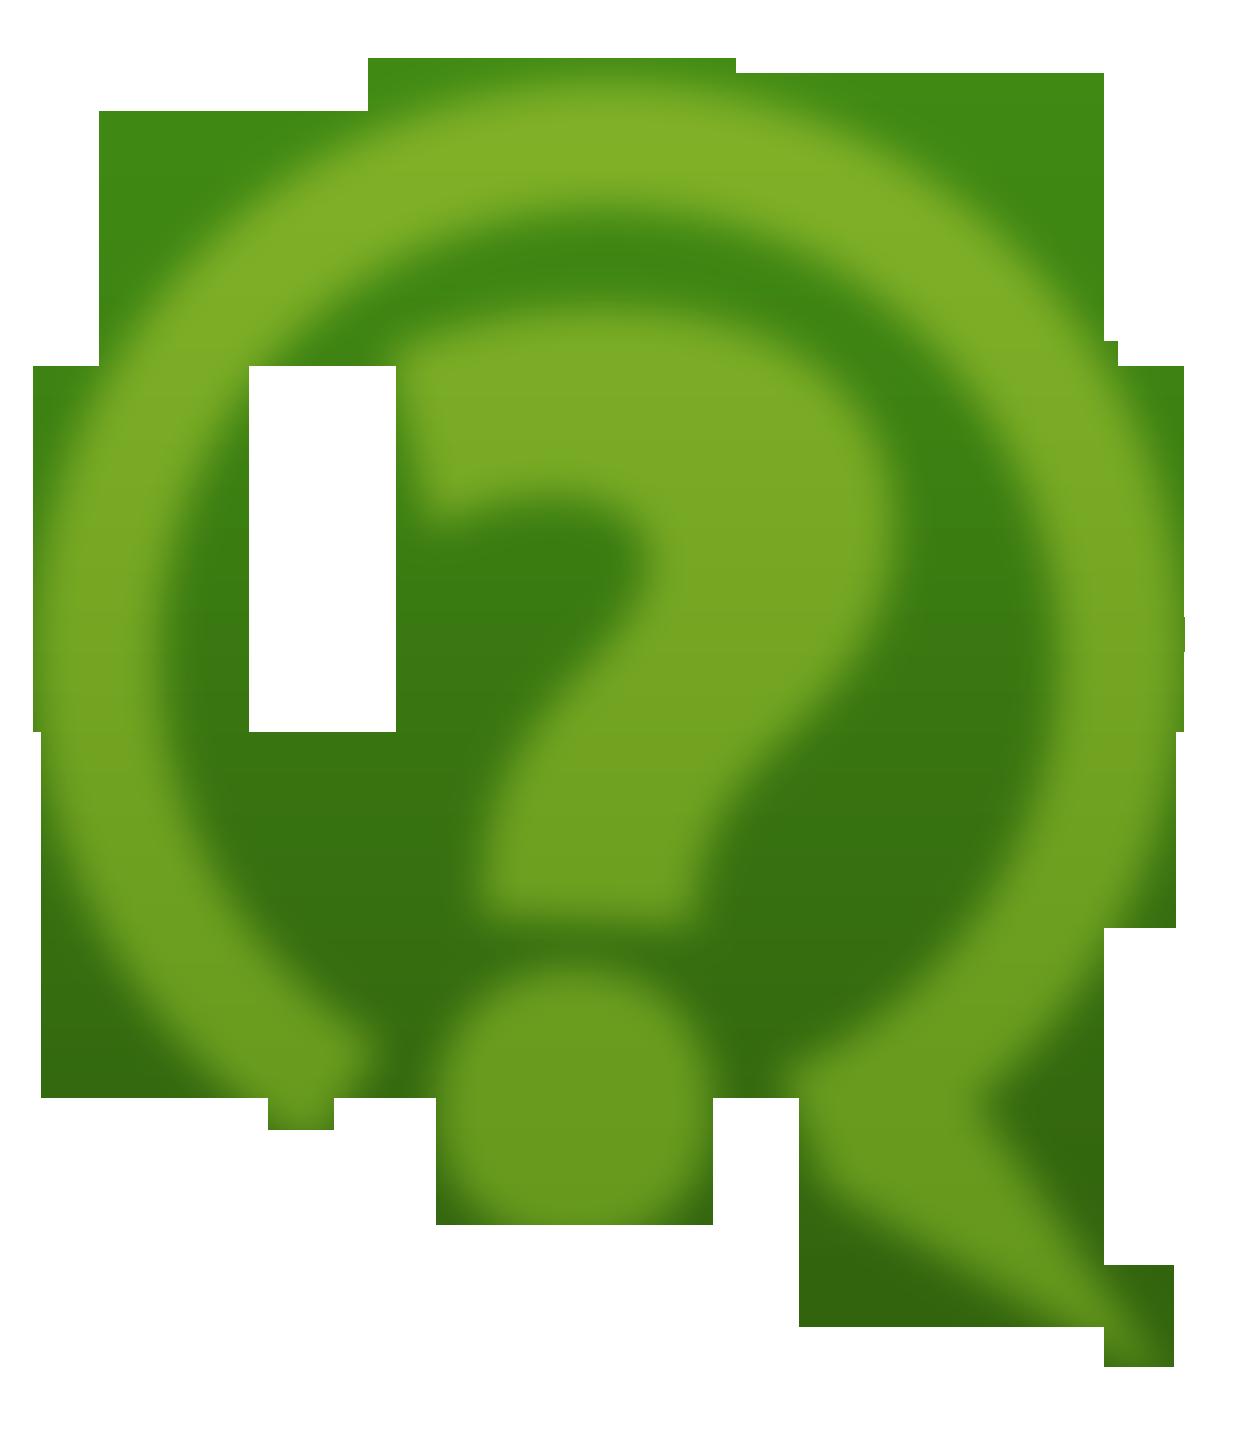 Question Mark clipart questions and answer Art com art question pdclipart